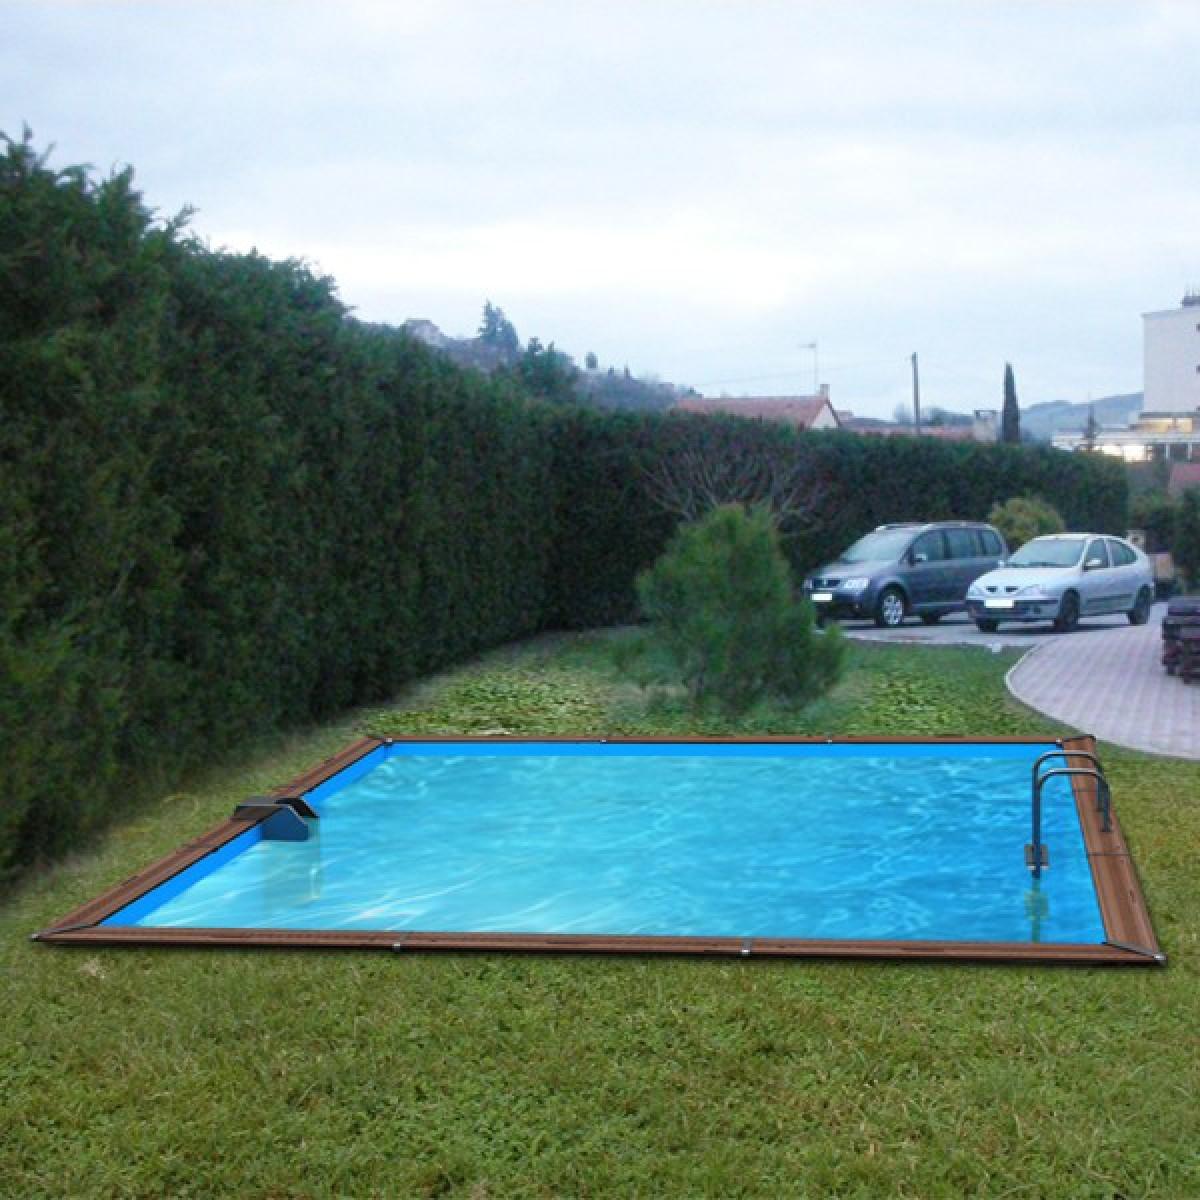 Piscine bois waterclip solta 5m20 for Piscine bois carree